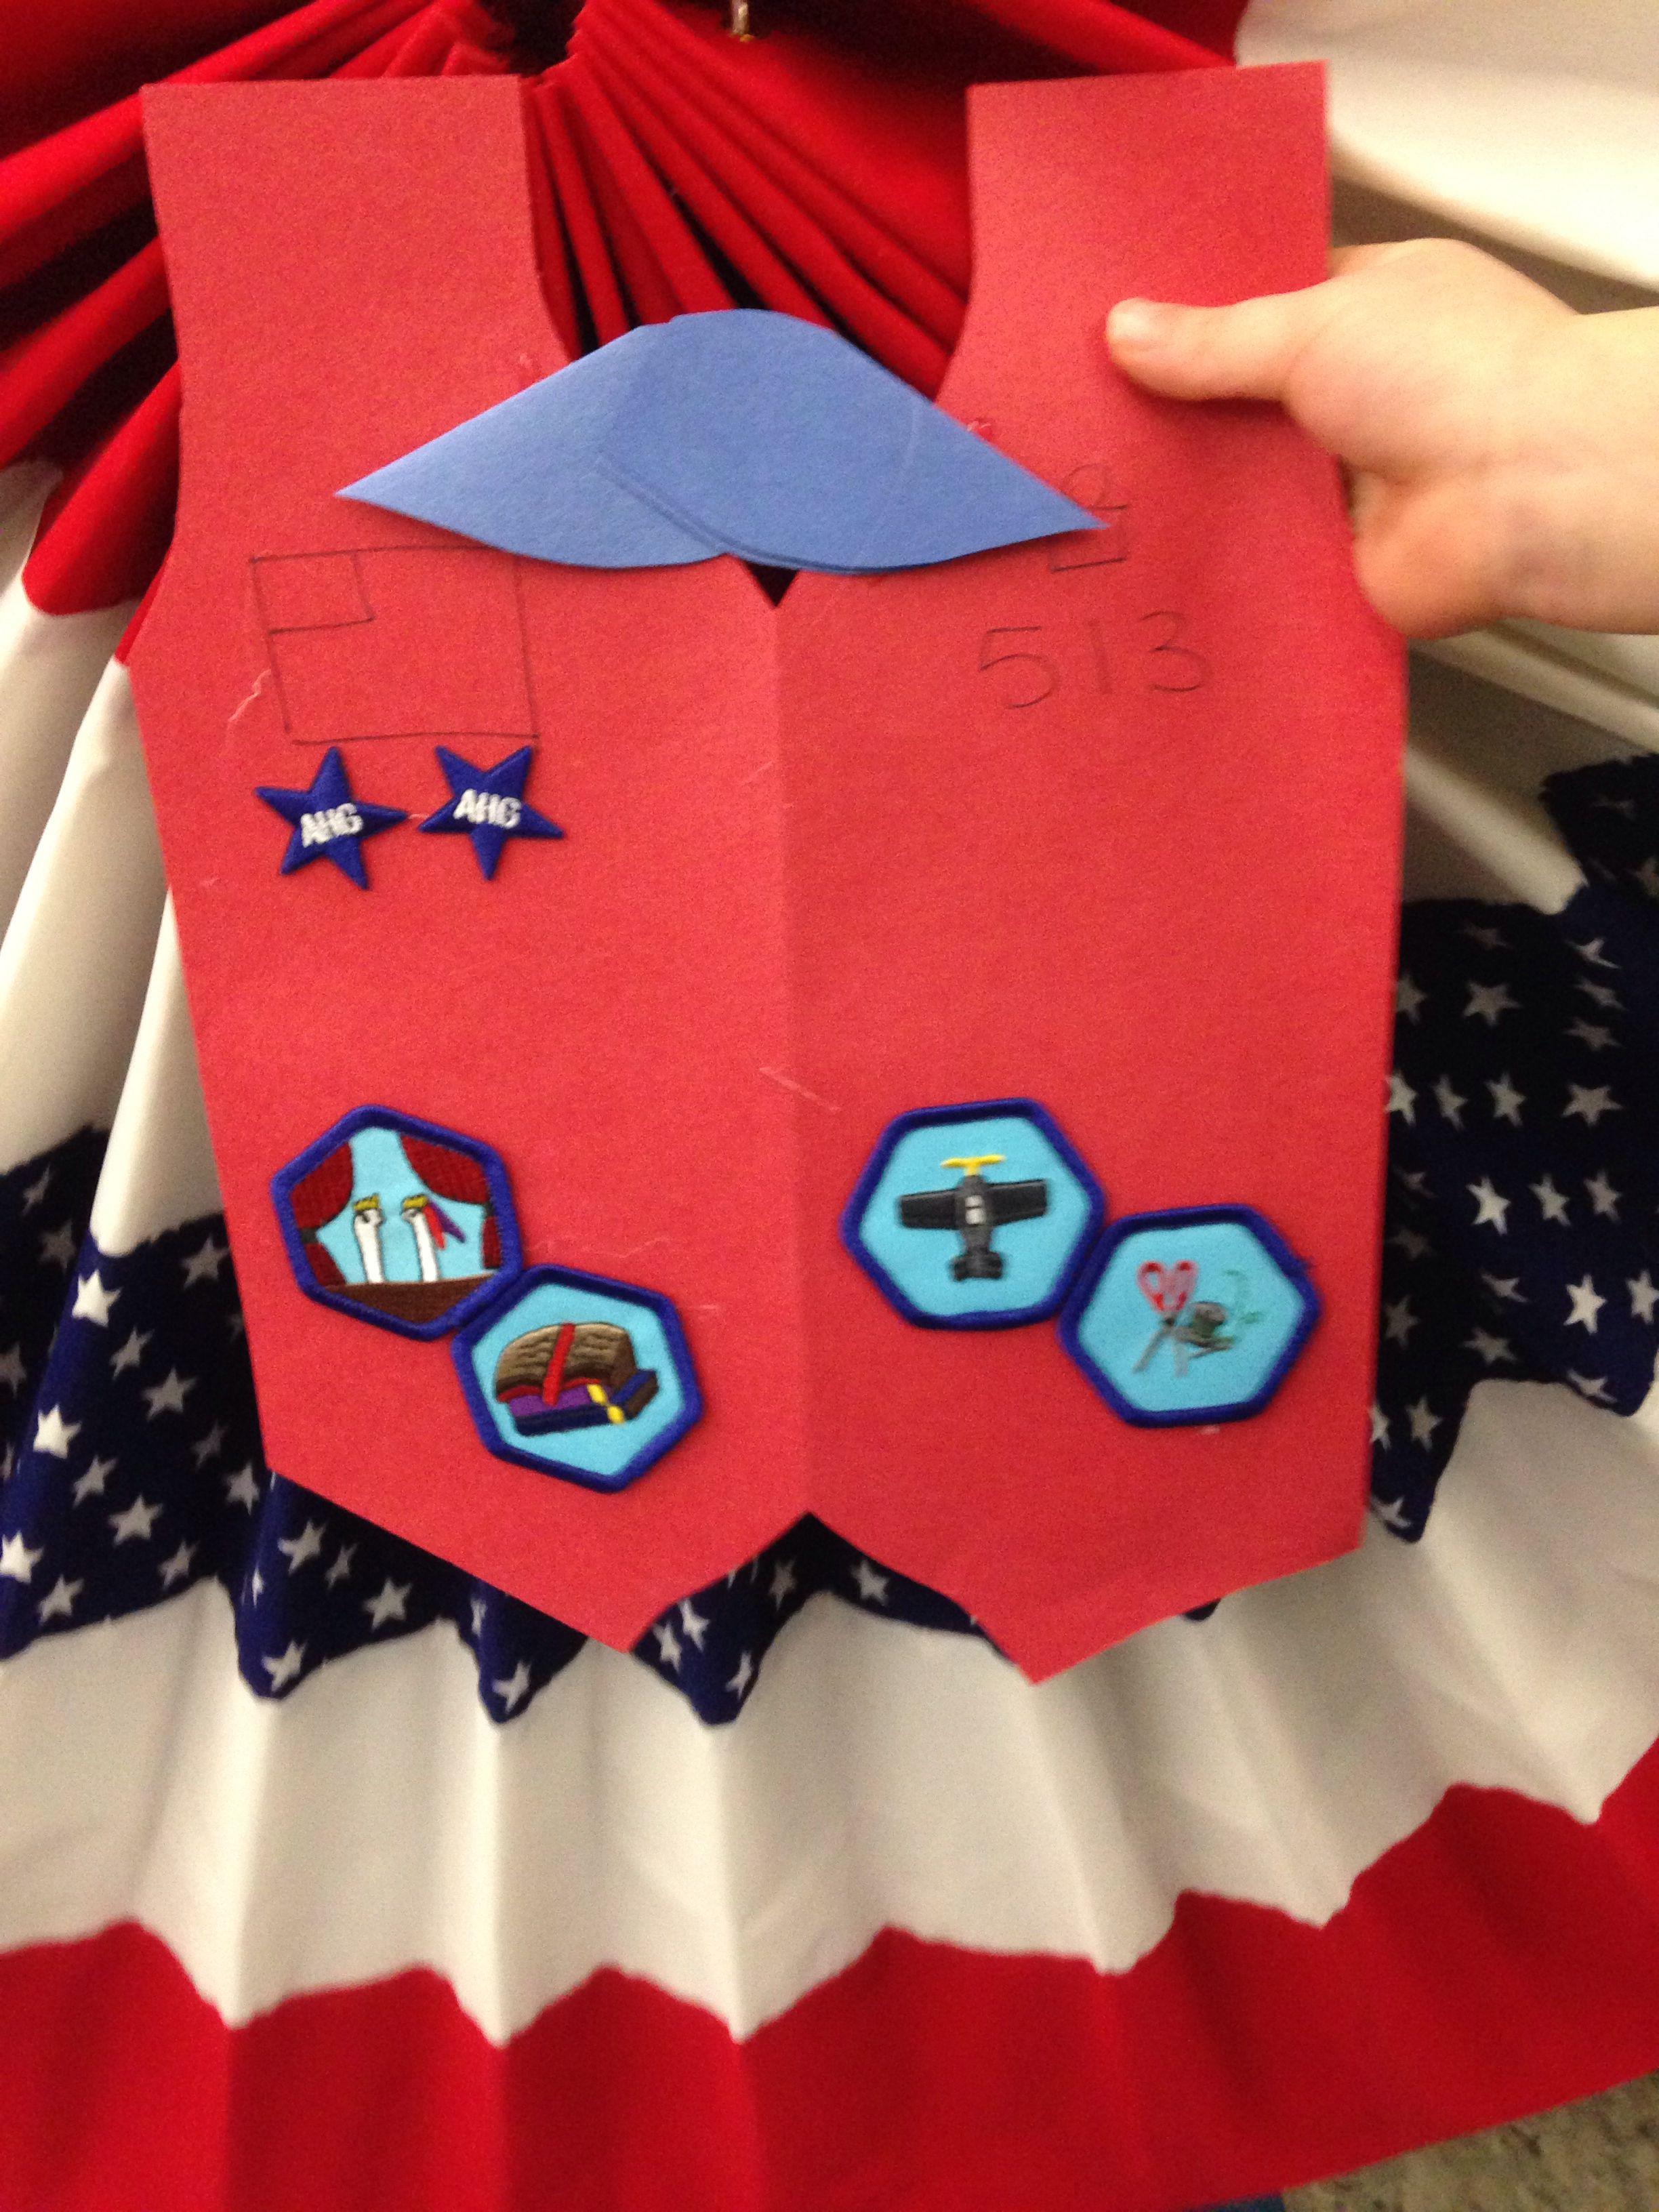 American Heritage Girls Court Of Awards Badges